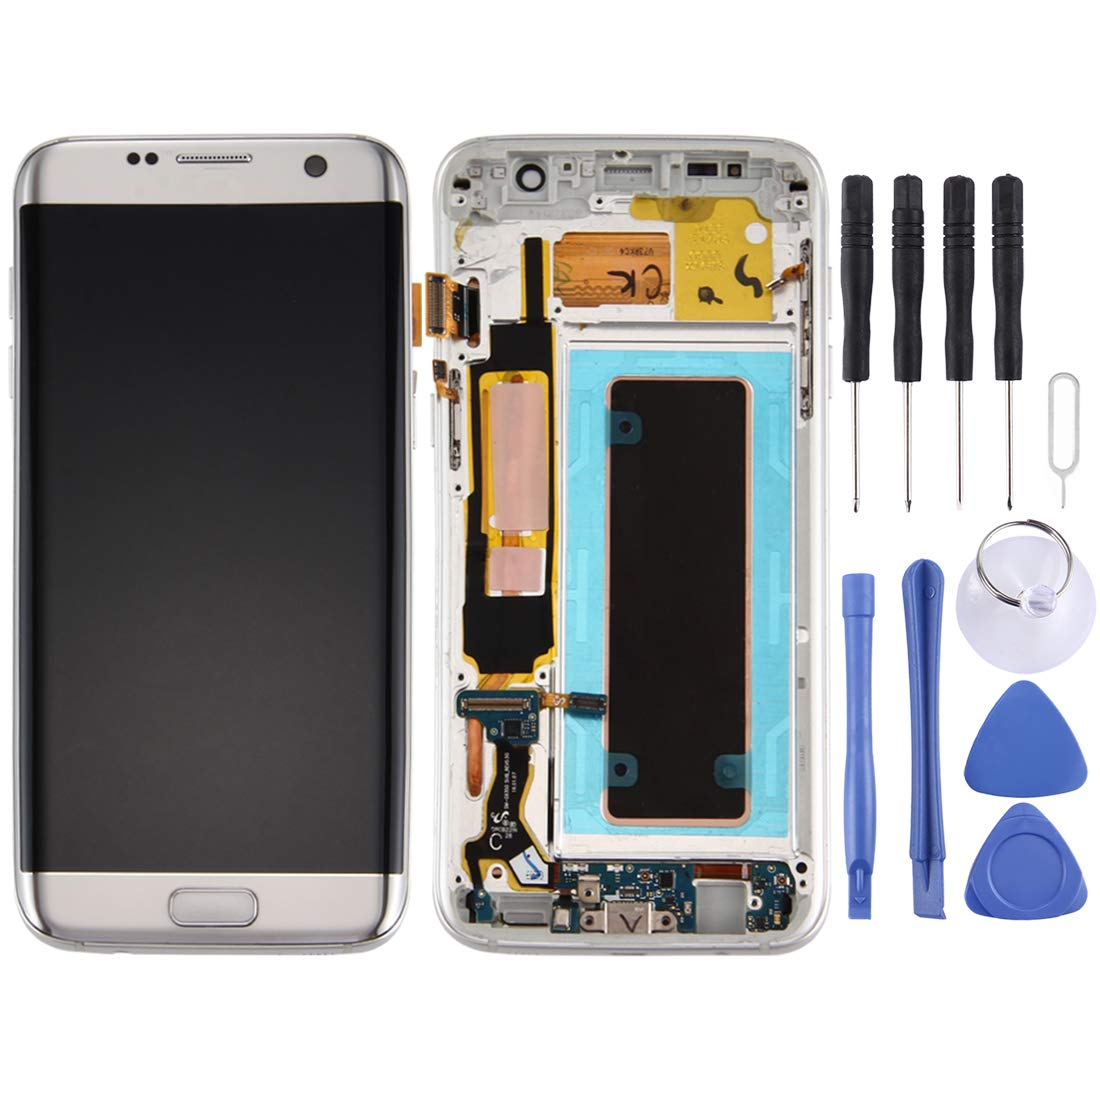 Anstorematealliance LCD screen GuoBo新しいLCDスクリーンとデジタイザーフルアセンブリ、フレームと充電ポートボード、ボリュームボタンとGalaxy S7 Edge用電源ボタン、G935F(ブラック) (色 : Silver) B07PRMD65K Silver